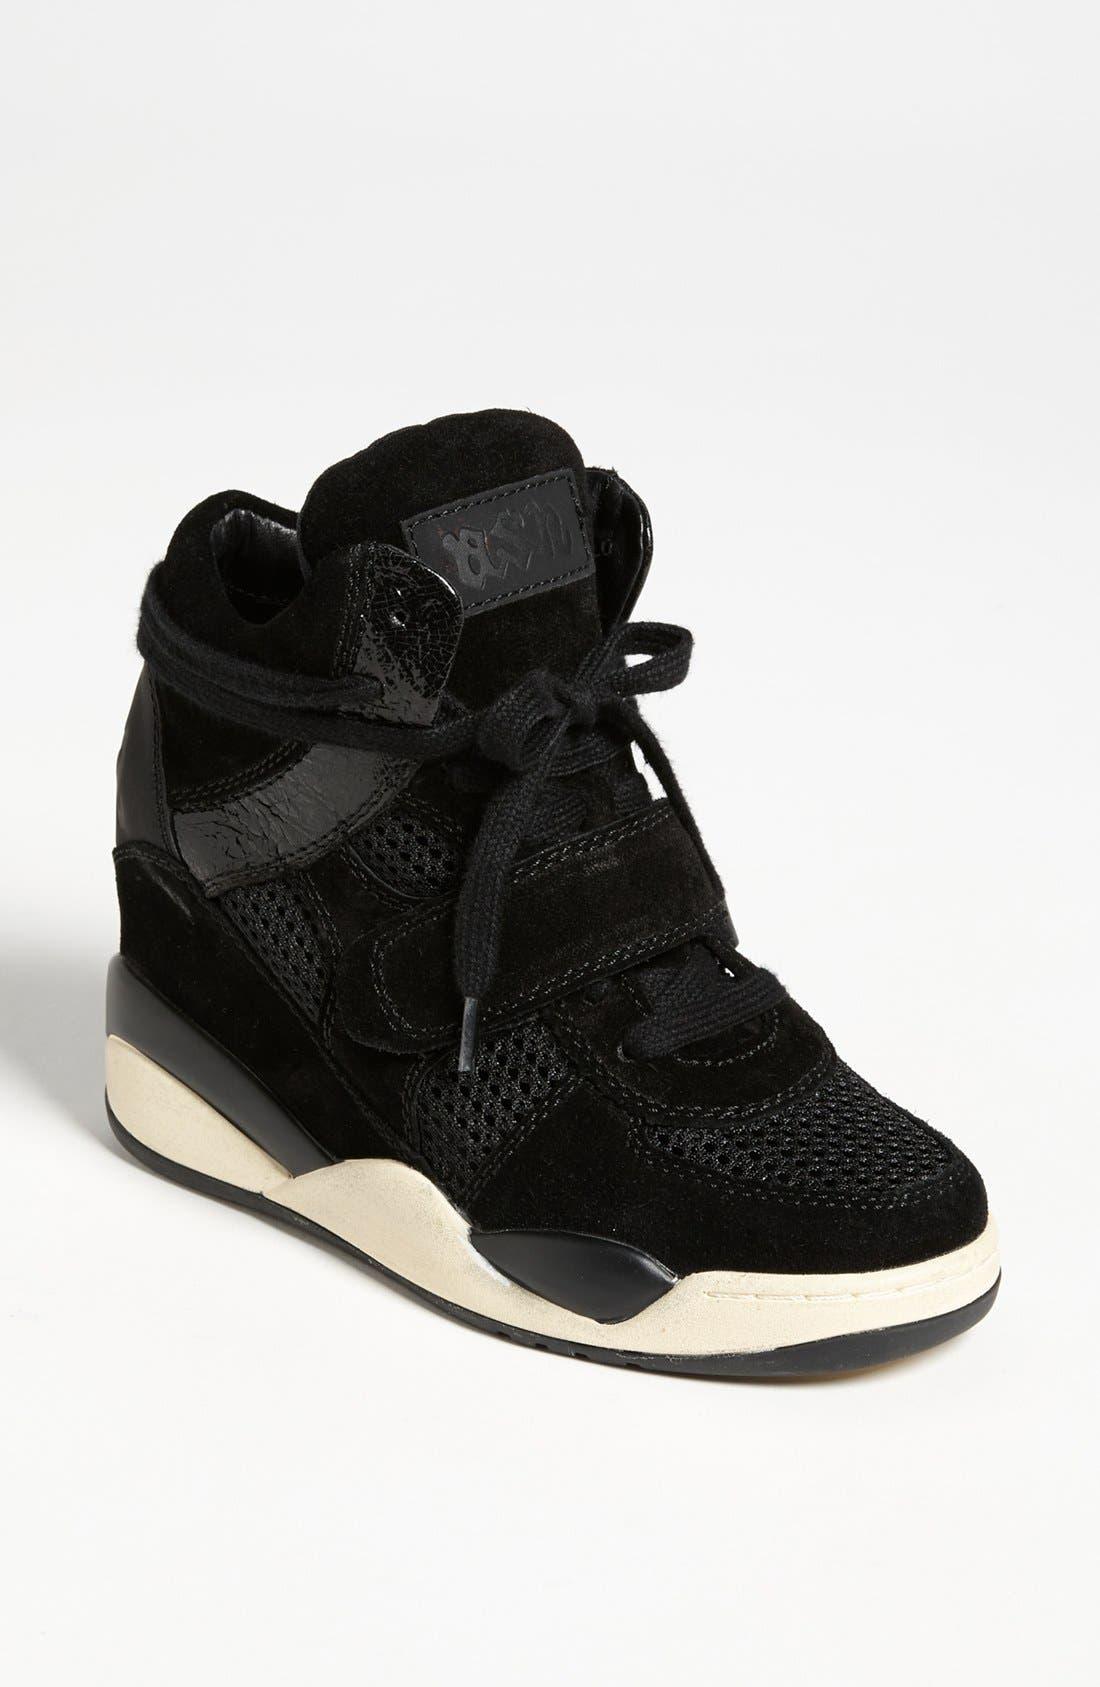 Alternate Image 1 Selected - Ash 'Funky Bis' Sneaker